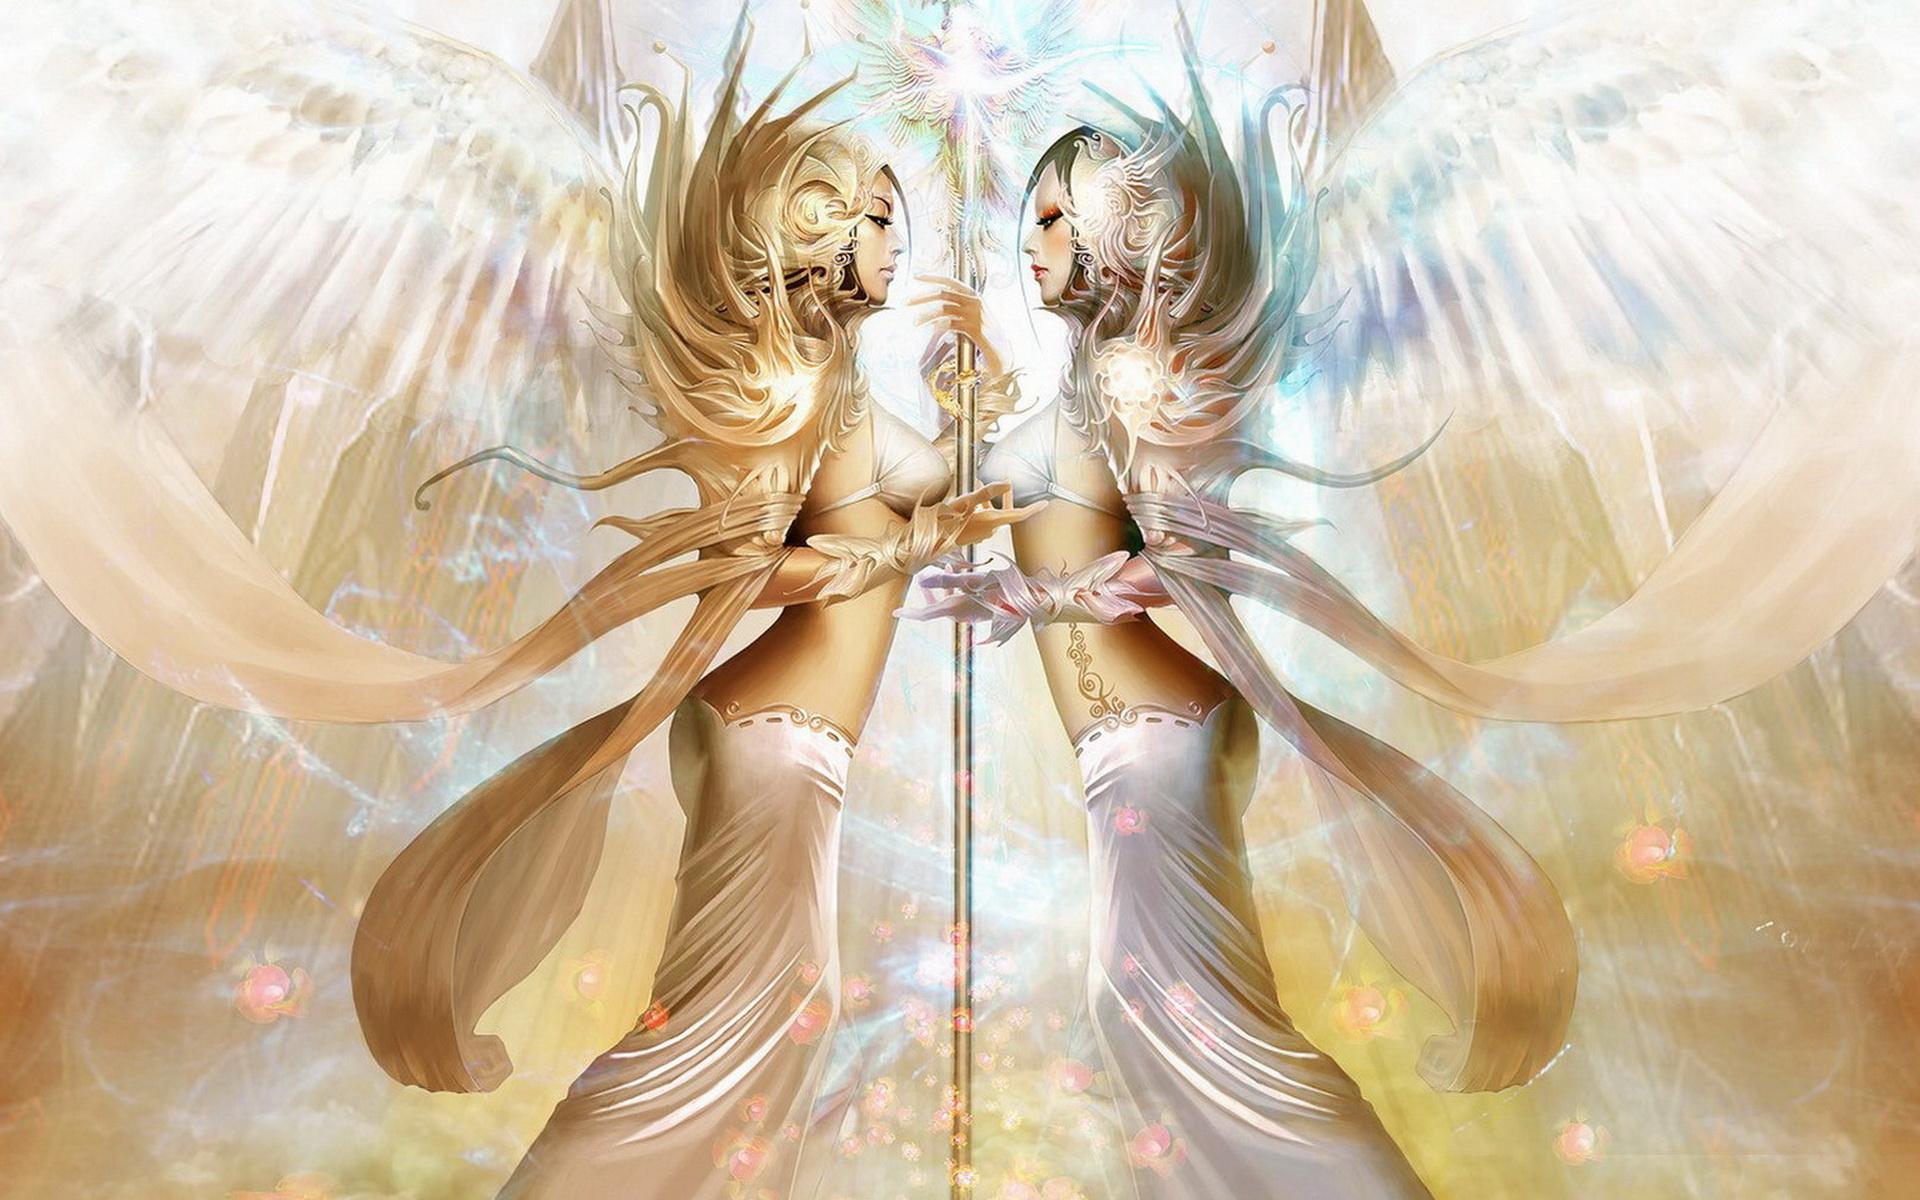 http://www.zastavki.com/pictures/1920x1200/2010/Fantasy_Charming_angels_020021_.jpg